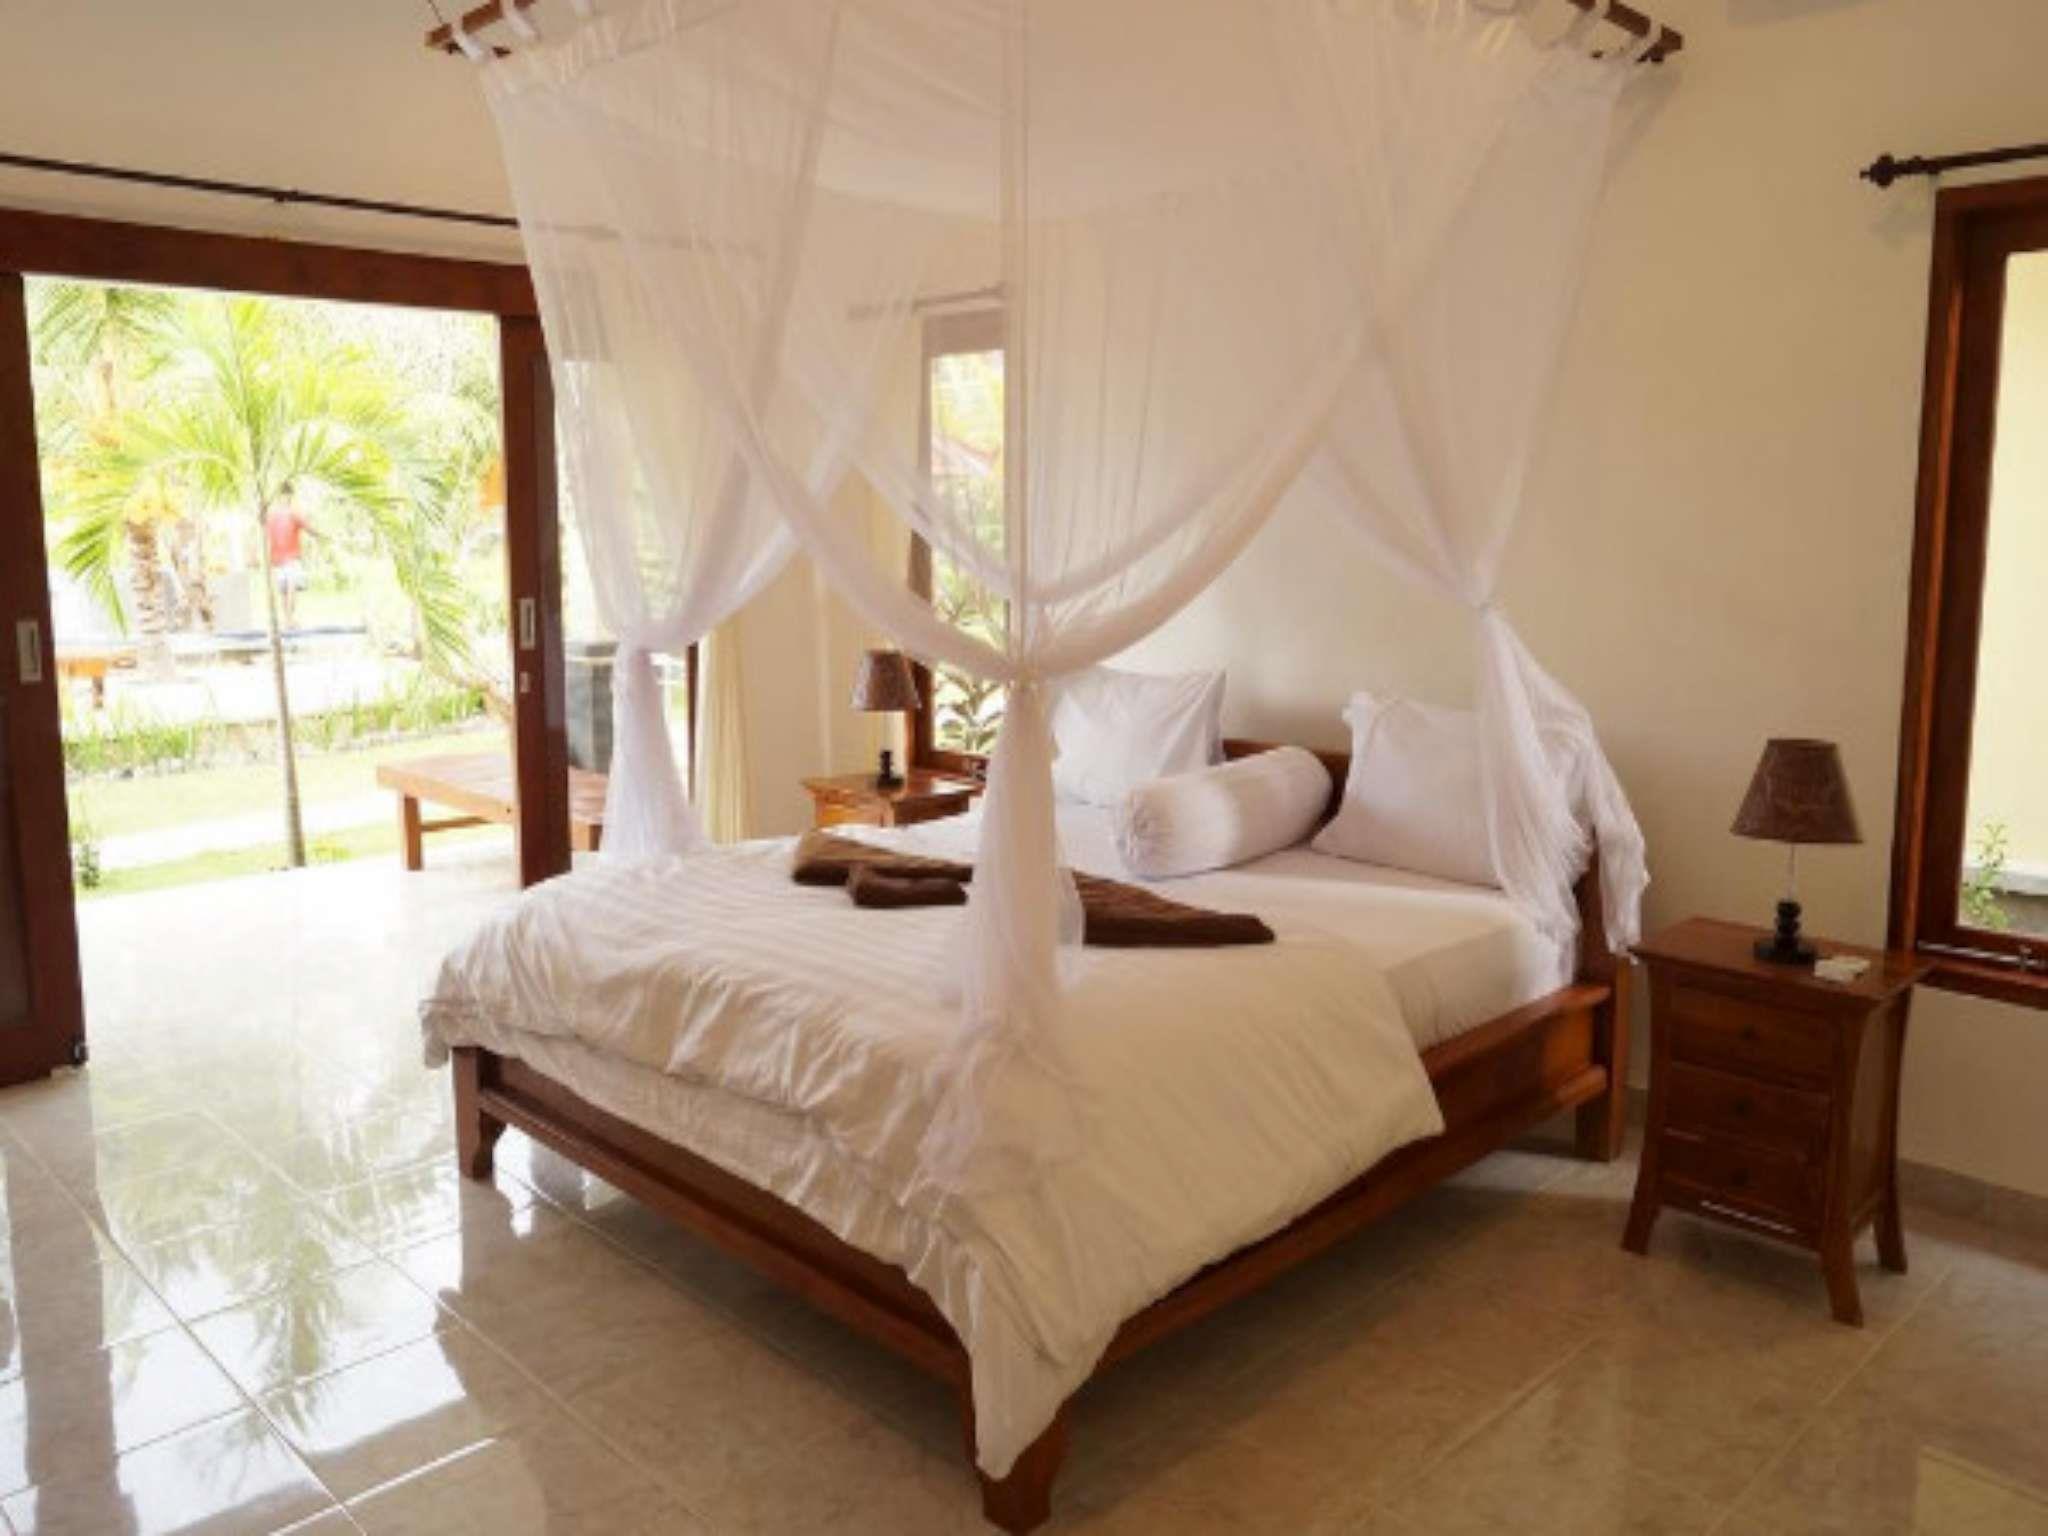 Studio Apartment Unit 2 at Mangga Villa Beach ホテル詳細